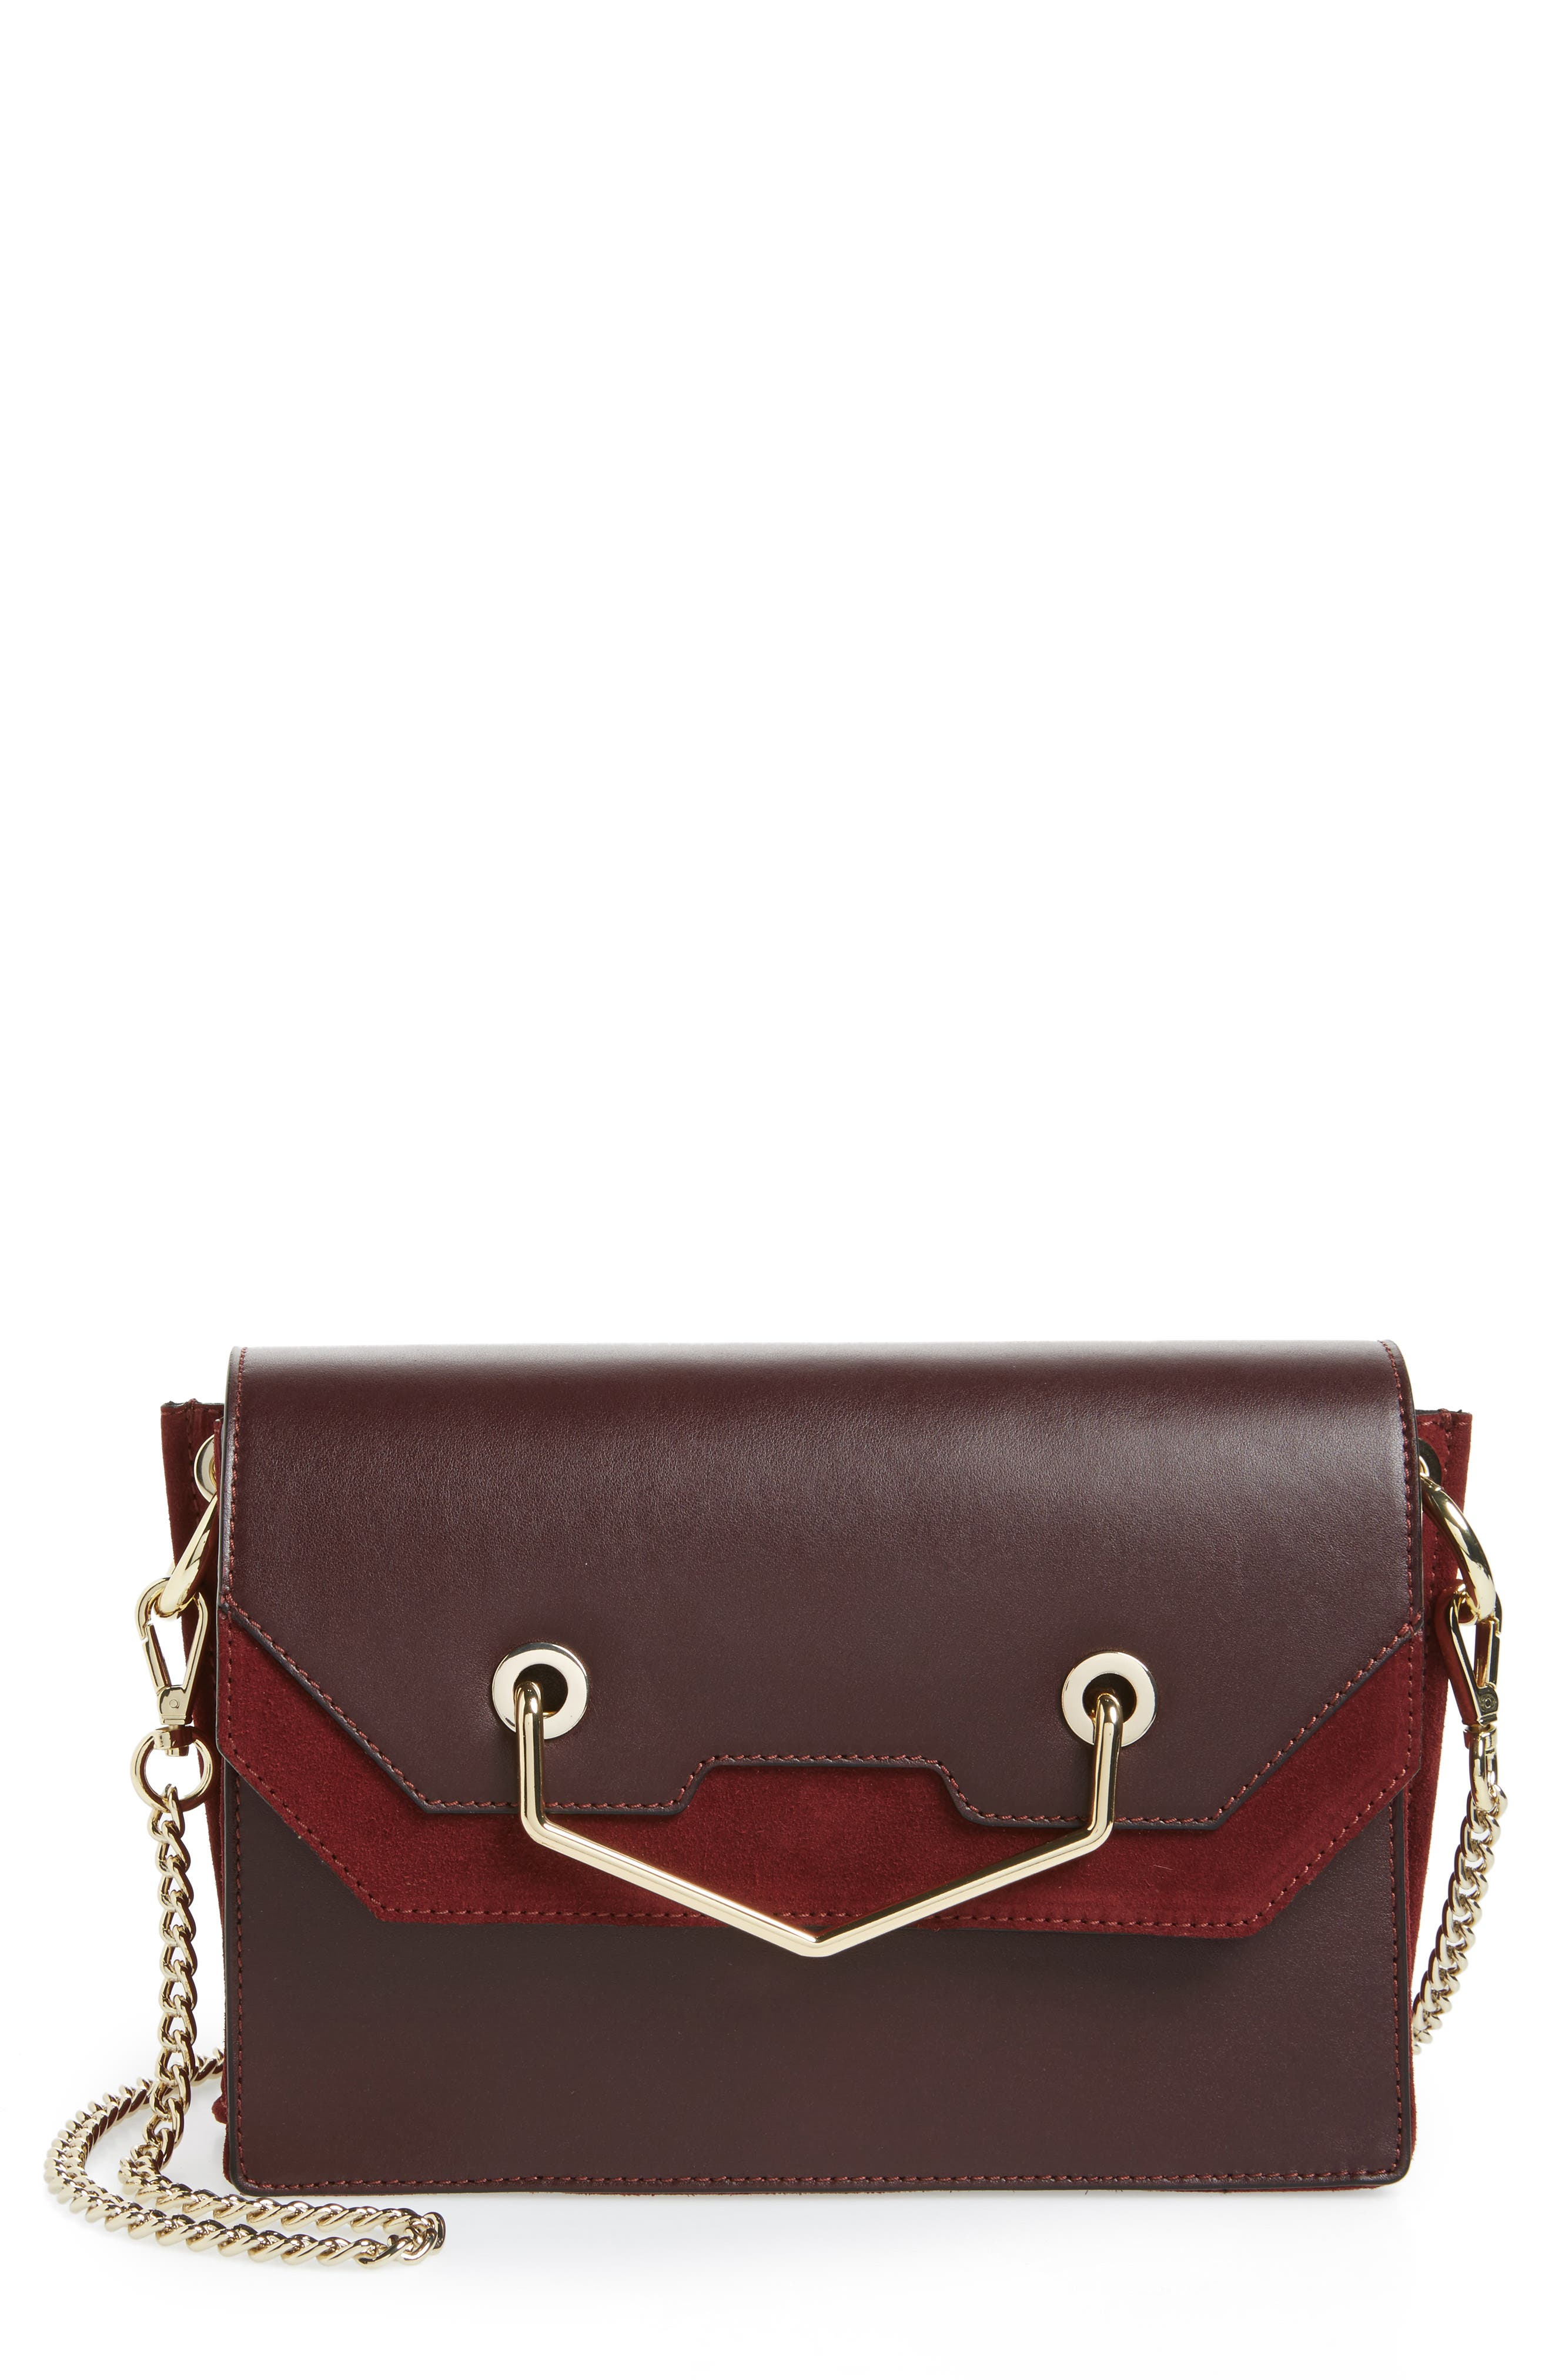 Premium Leather & Suede Soko Shoulder Bag,                             Main thumbnail 1, color,                             930